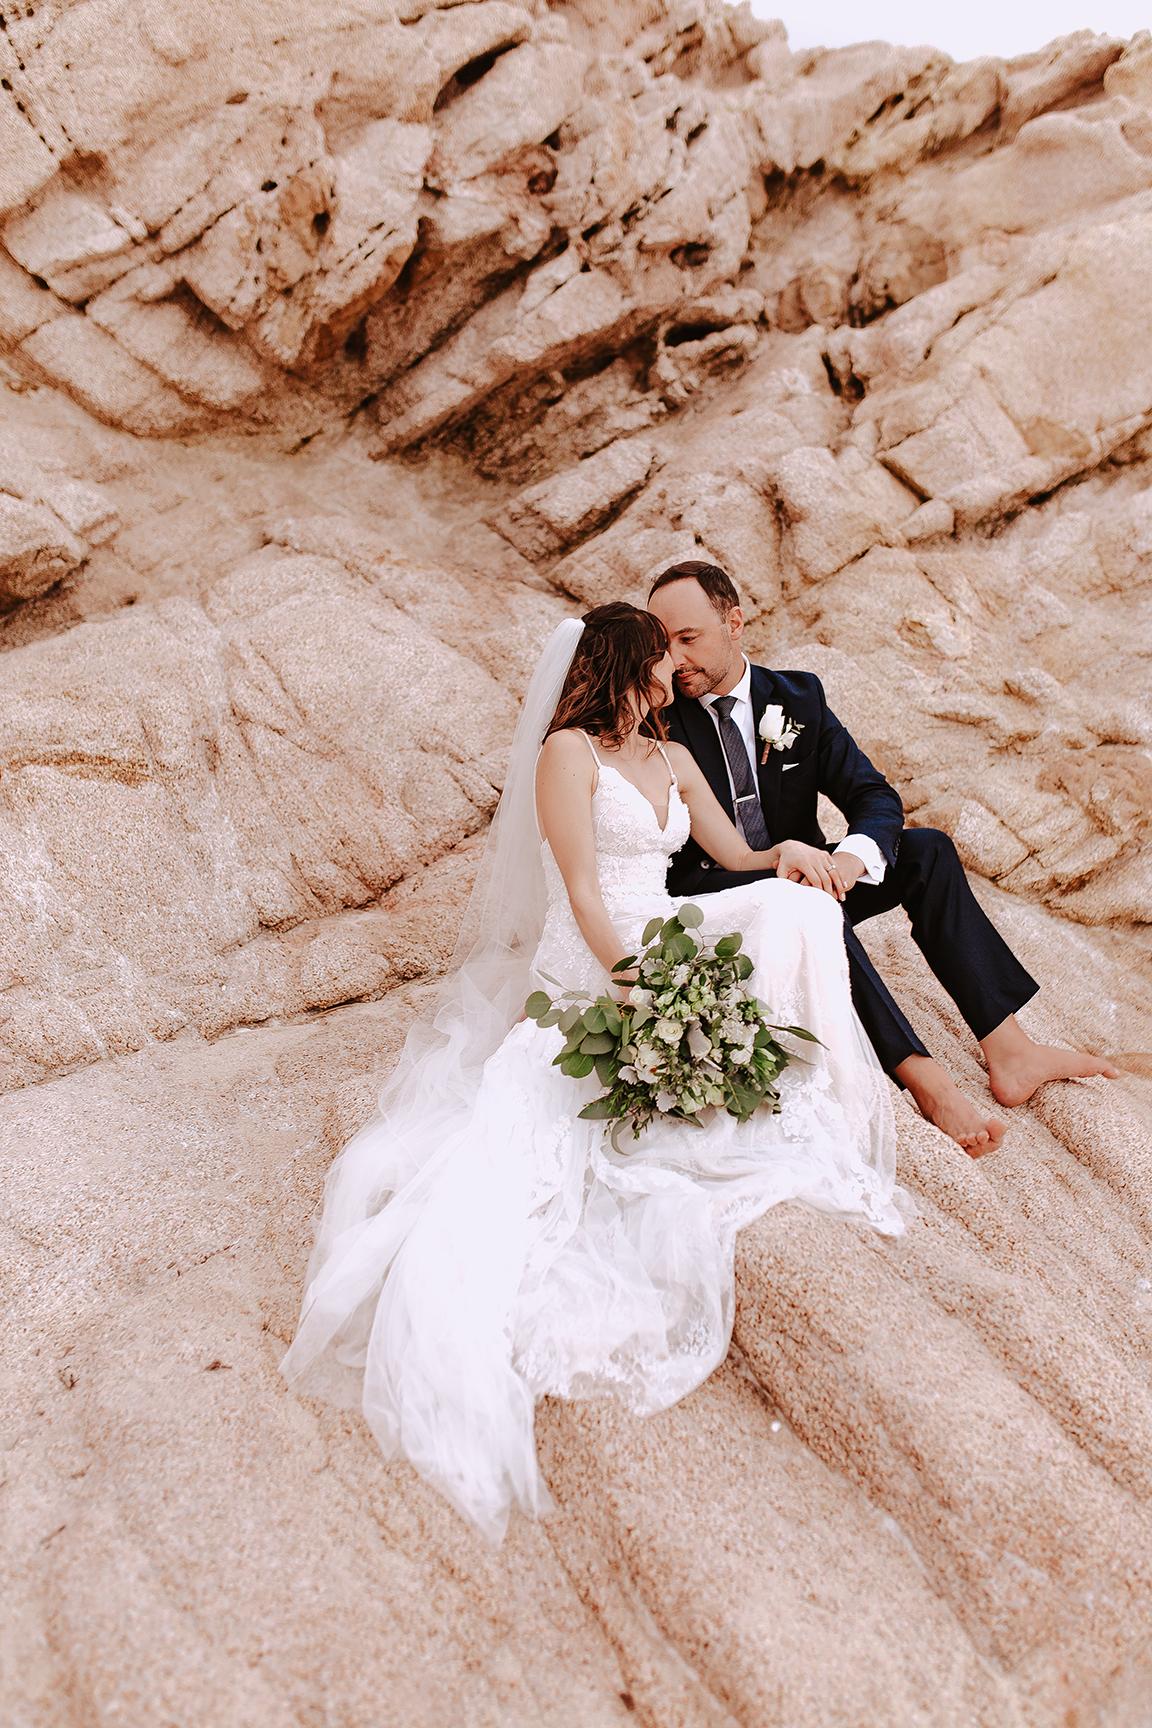 Lindsei+James_cabo_wedding_677.jpg